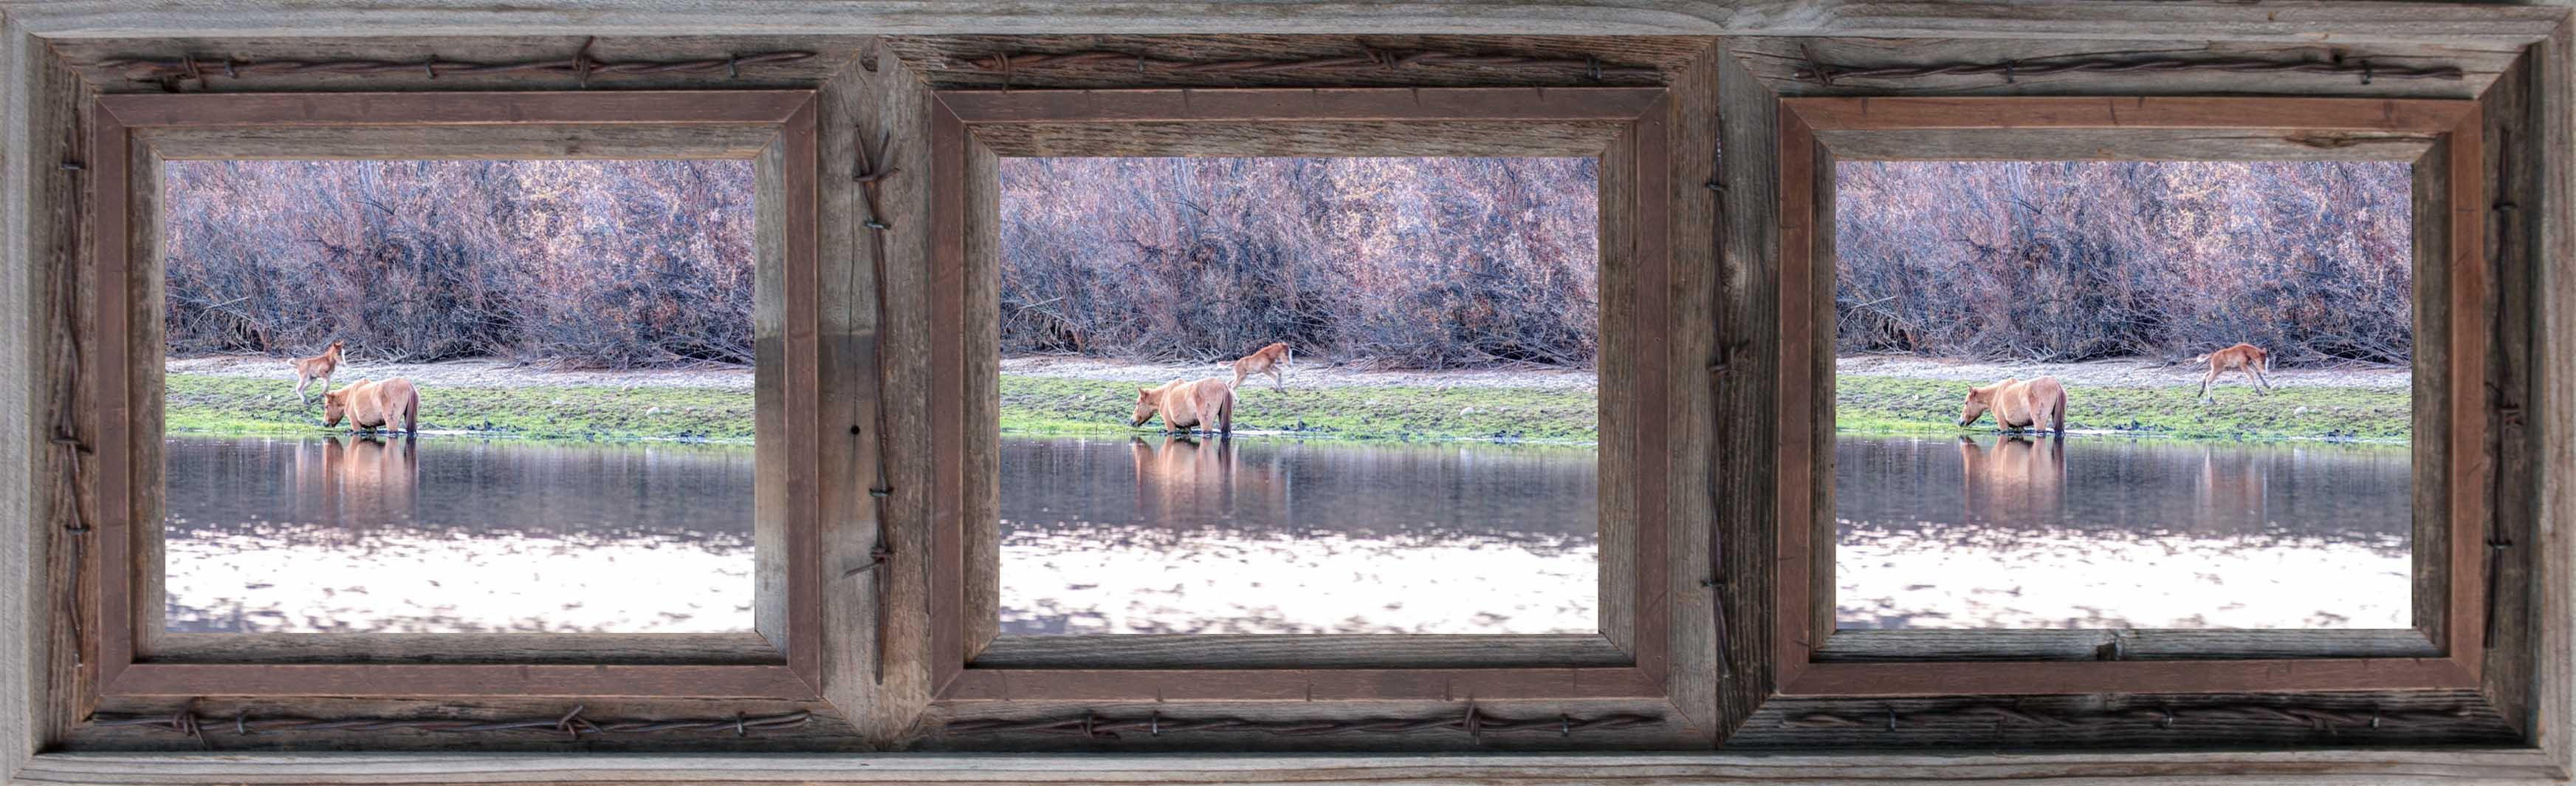 limited edition, fine art, prints, salt river, arizona, mustangs, river, mare, colt, horses, photograph, photo